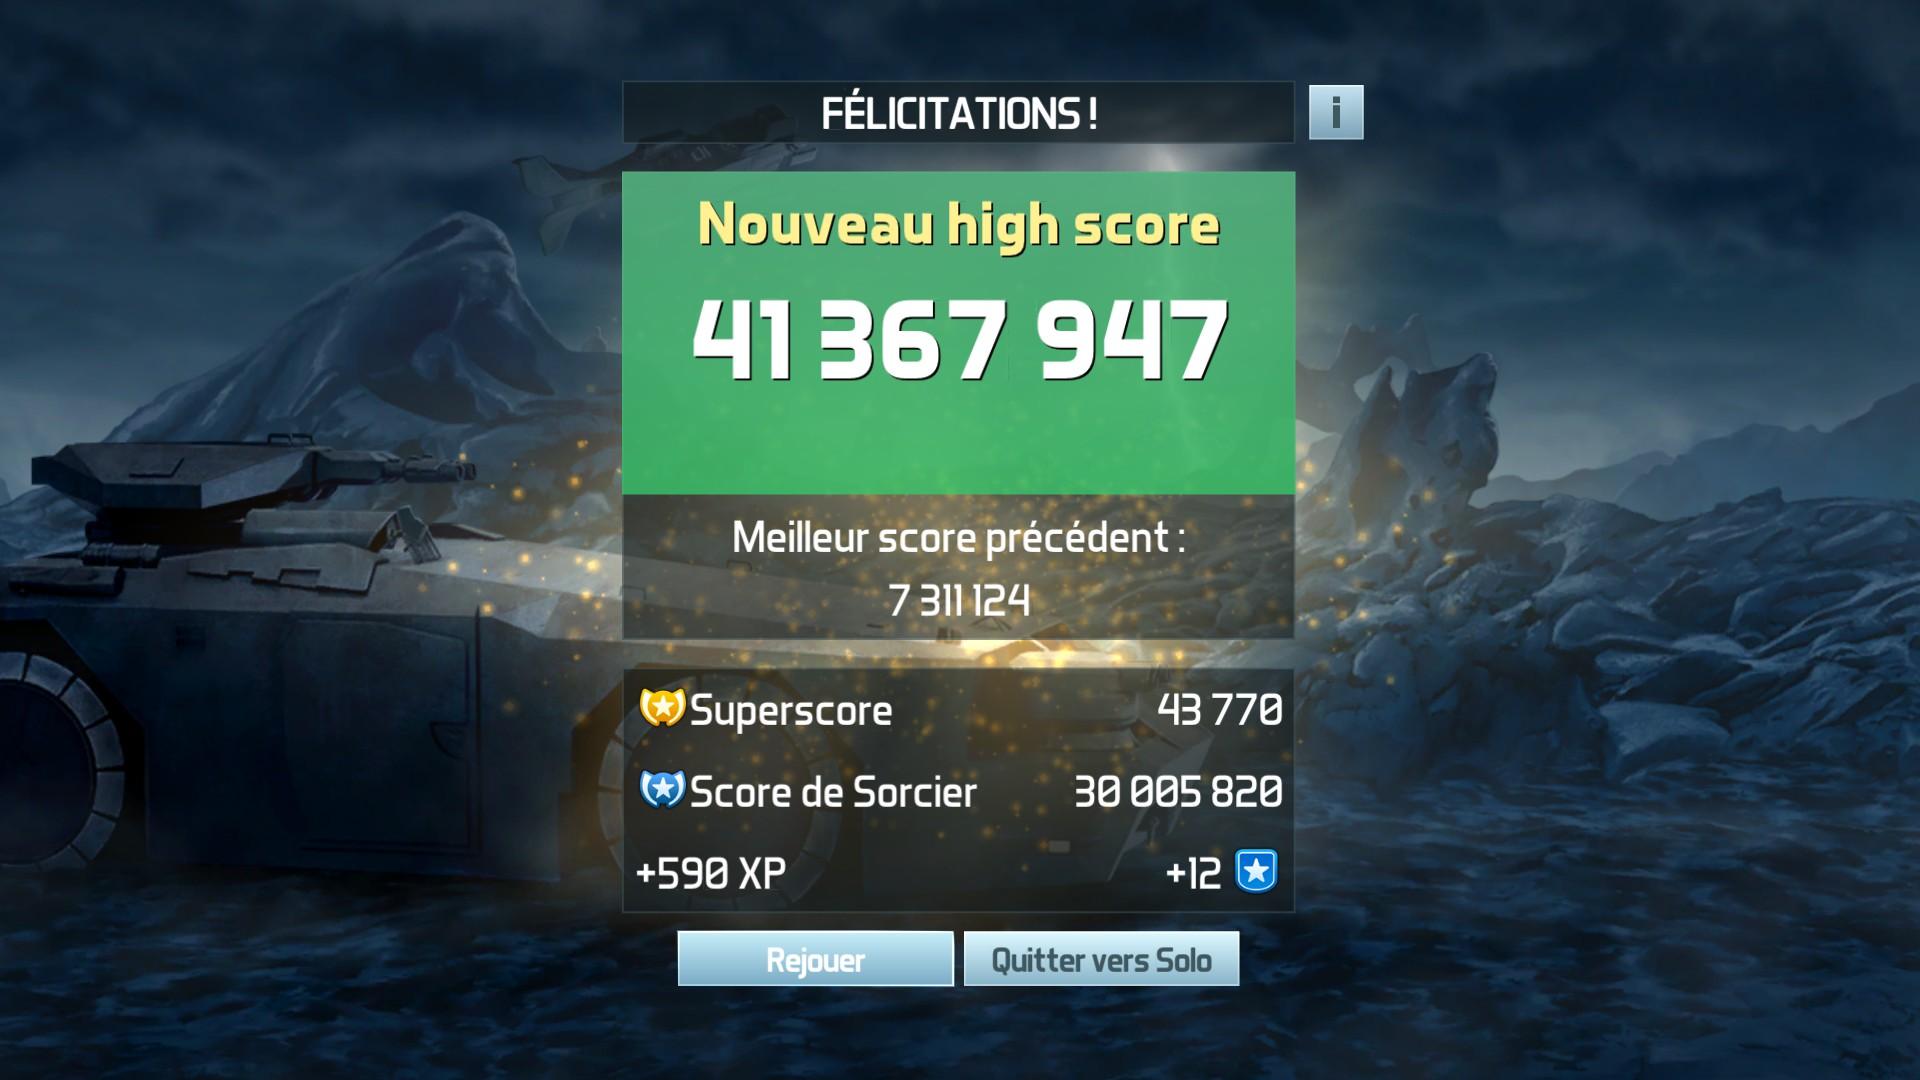 Mantalow: Pinball FX3: Aliens Pinball (PC) 41,367,947 points on 2018-01-17 01:13:49